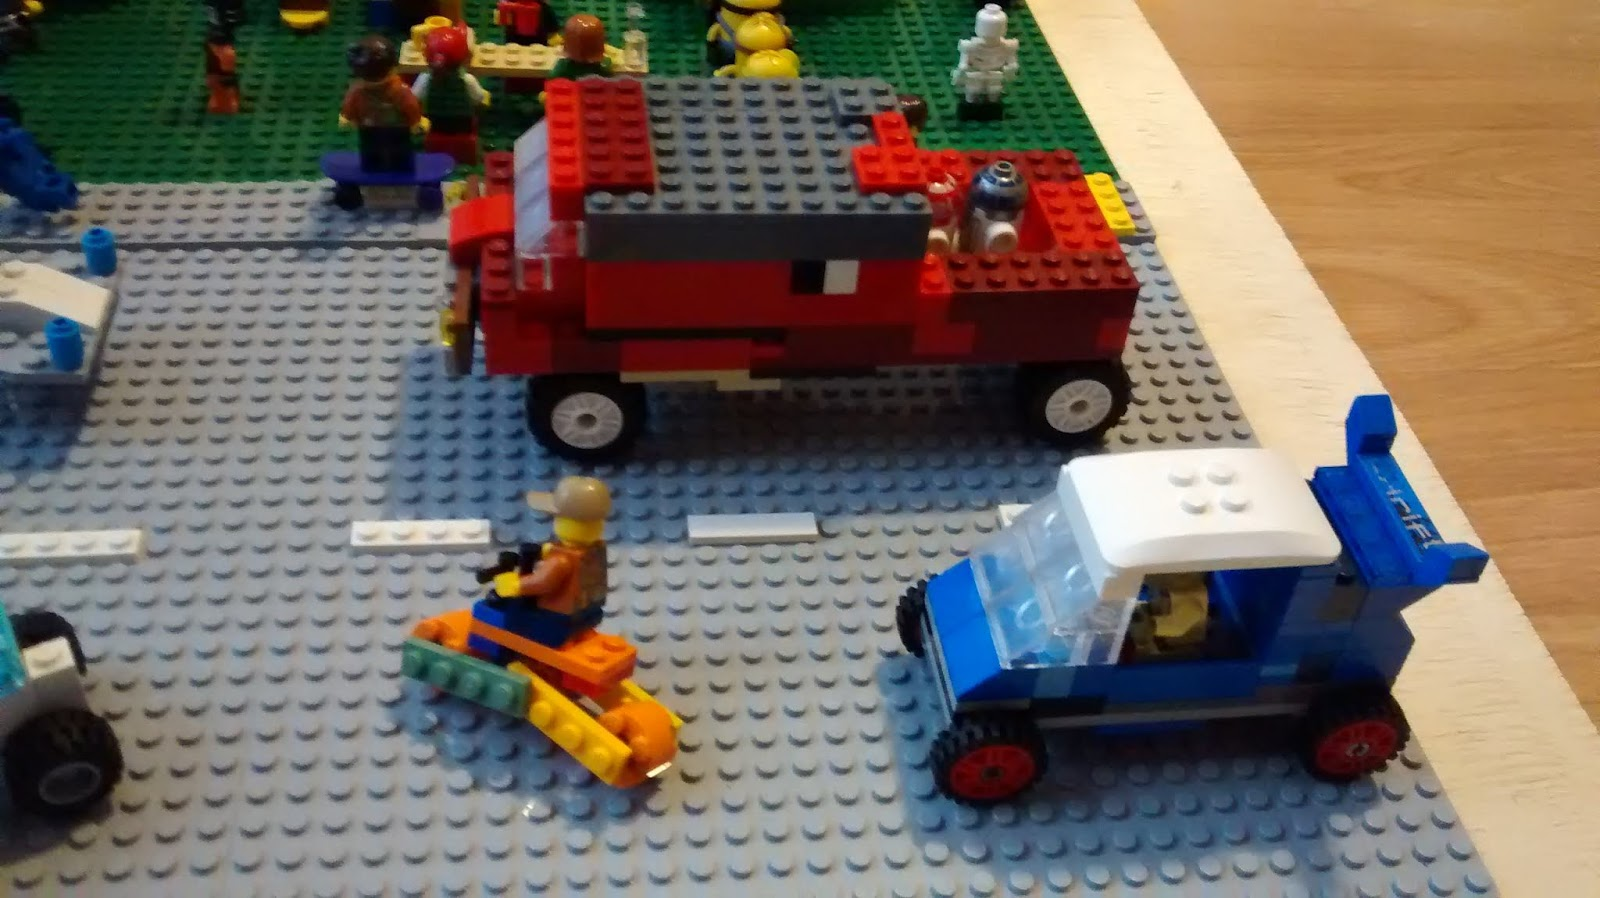 Eclectic Momma: Lego Contest: Plaza Pandemonium